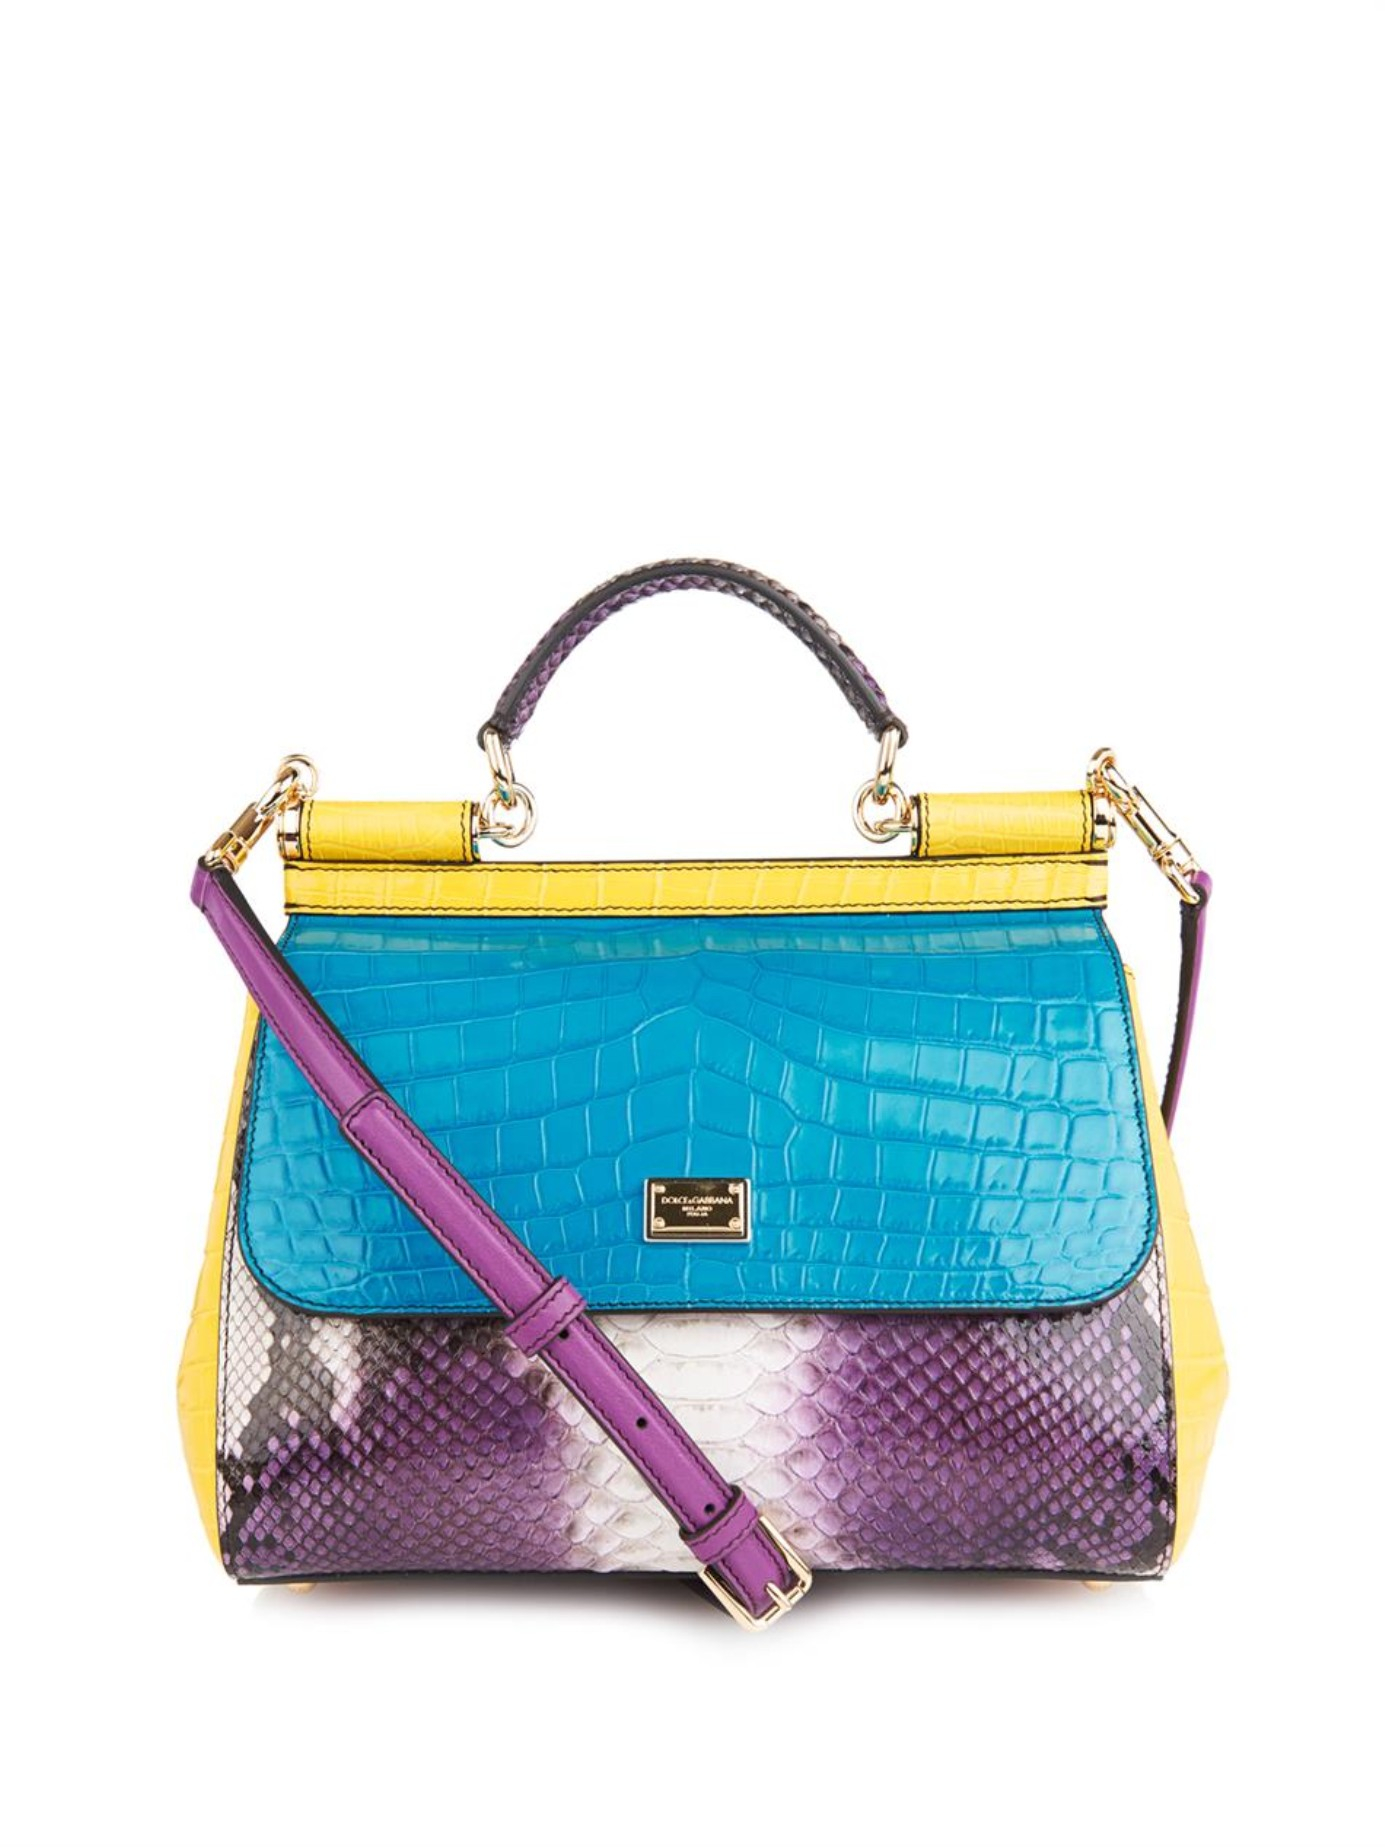 Lyst - Dolce   Gabbana Sicily Crocodile And Snake Cross-body Bag 6b77aa03d8